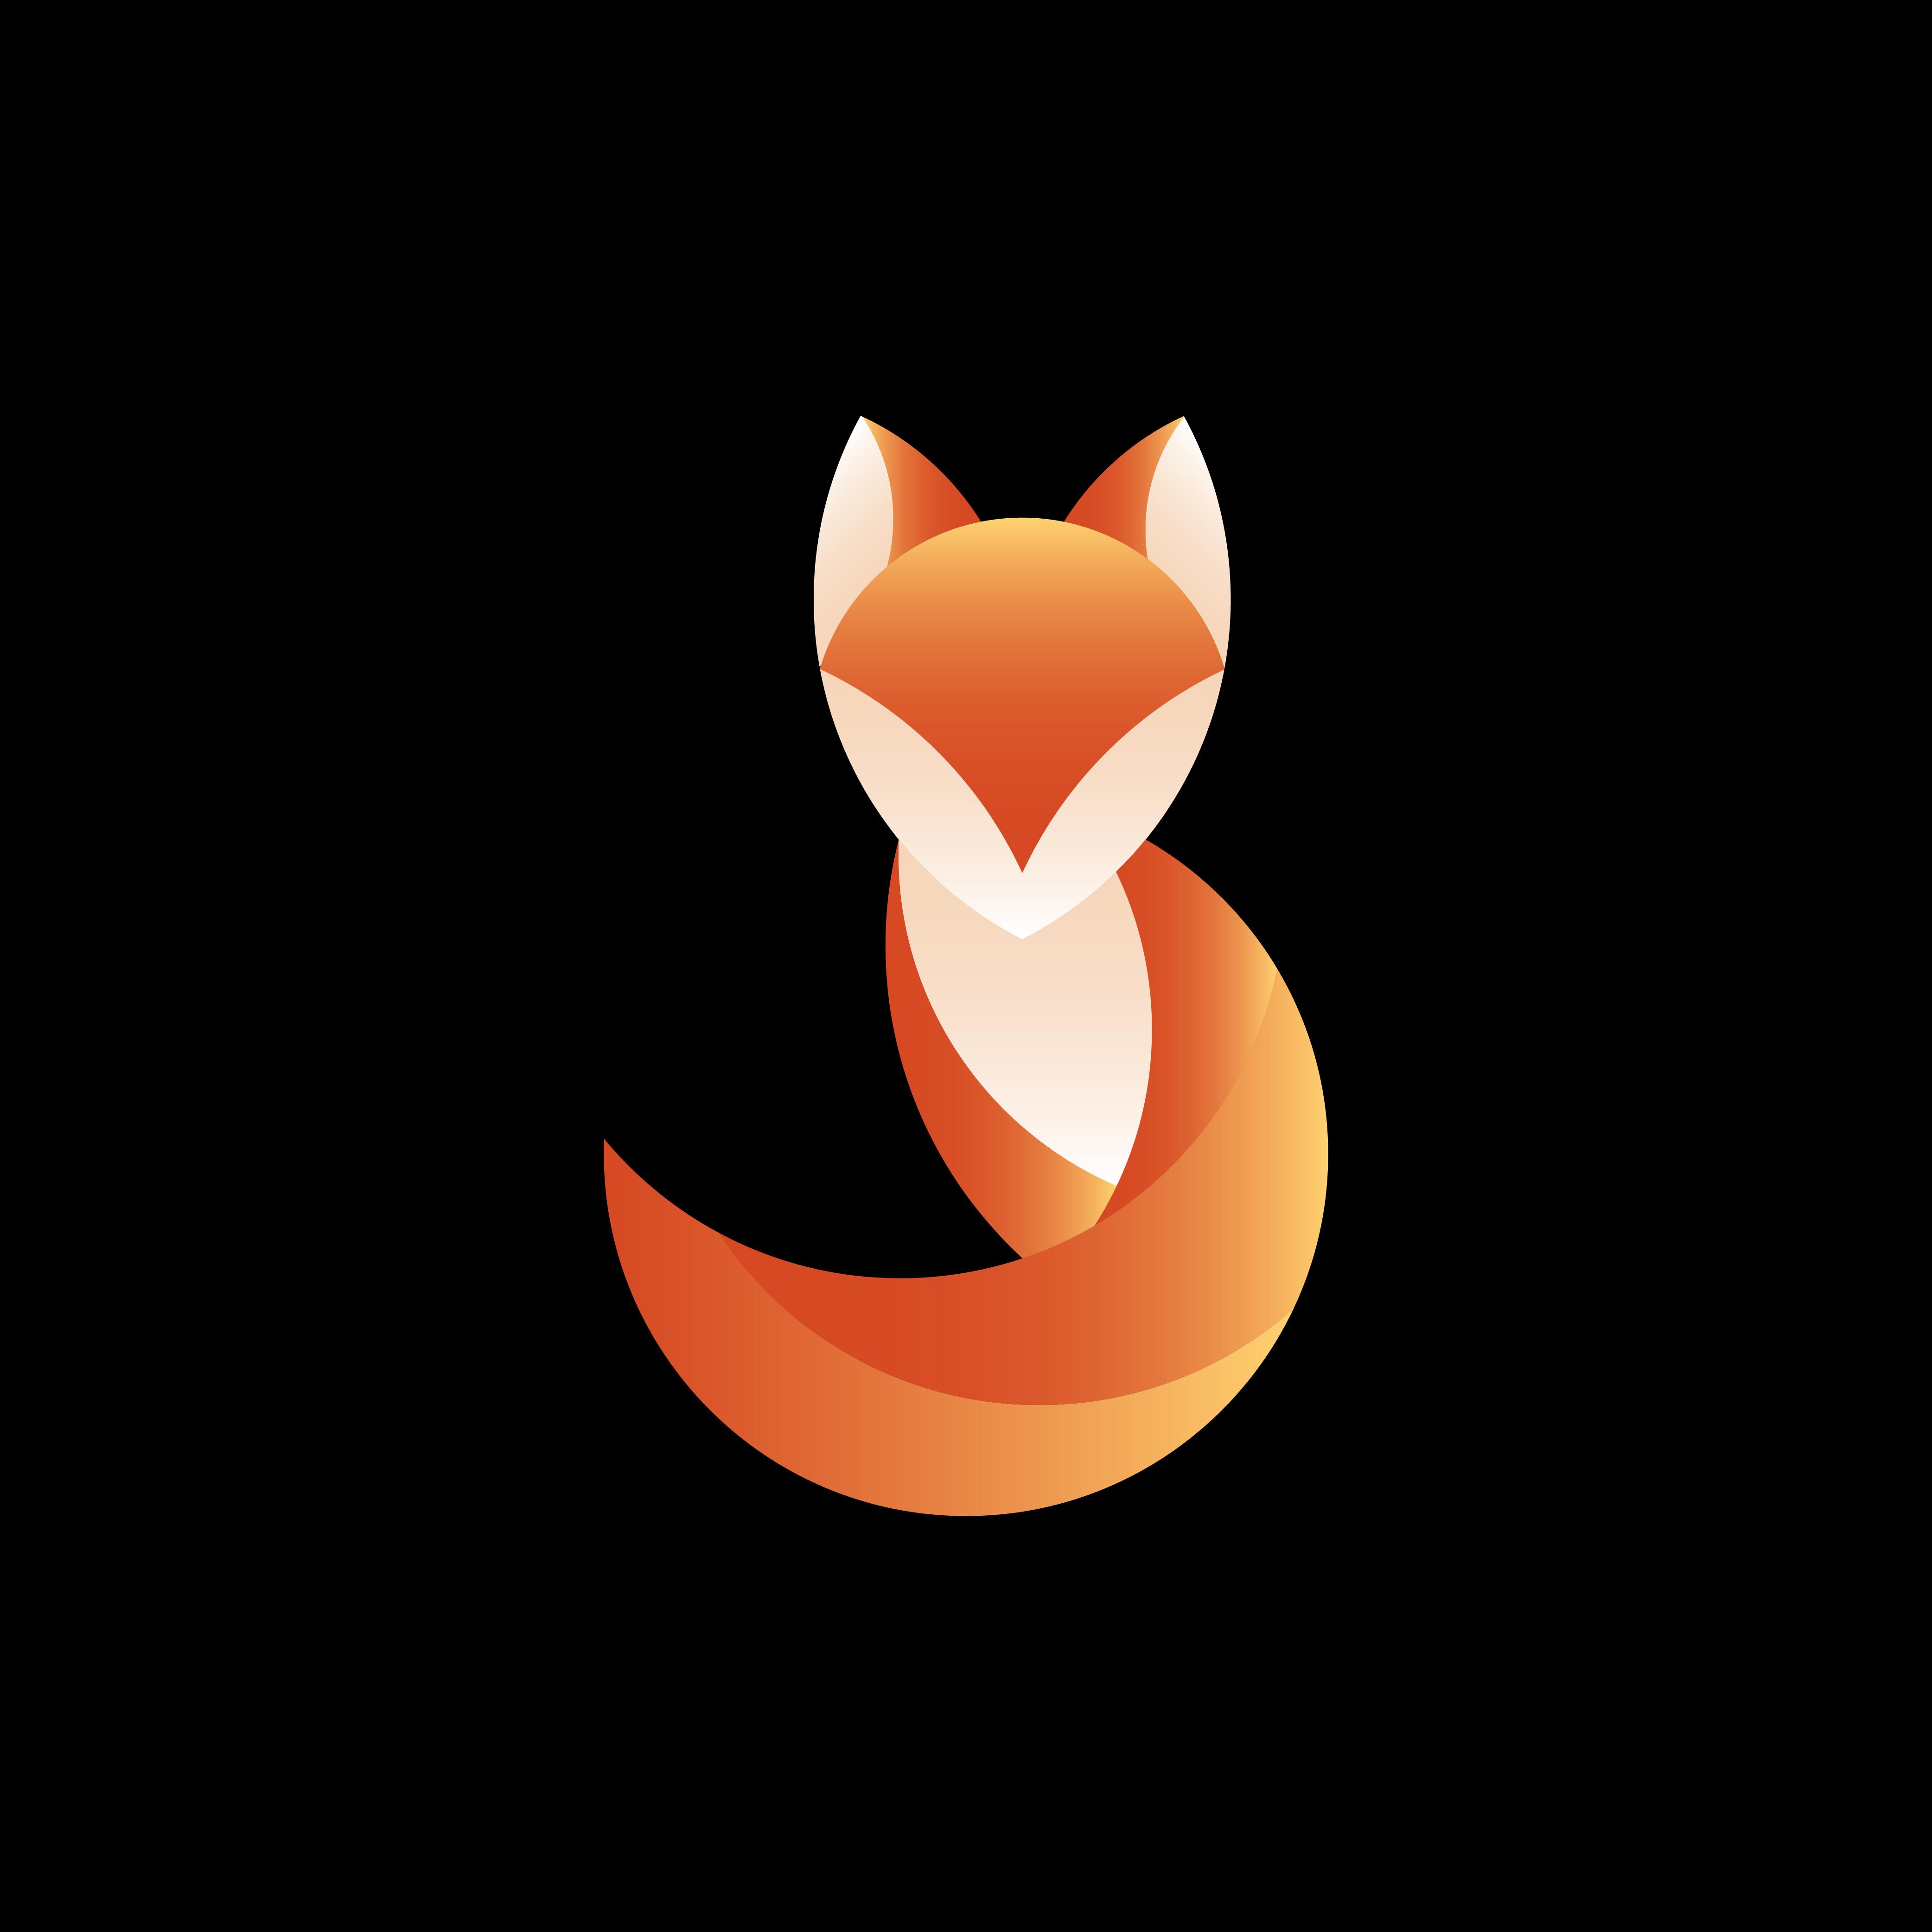 Fox Geometrical Animal Design Vector